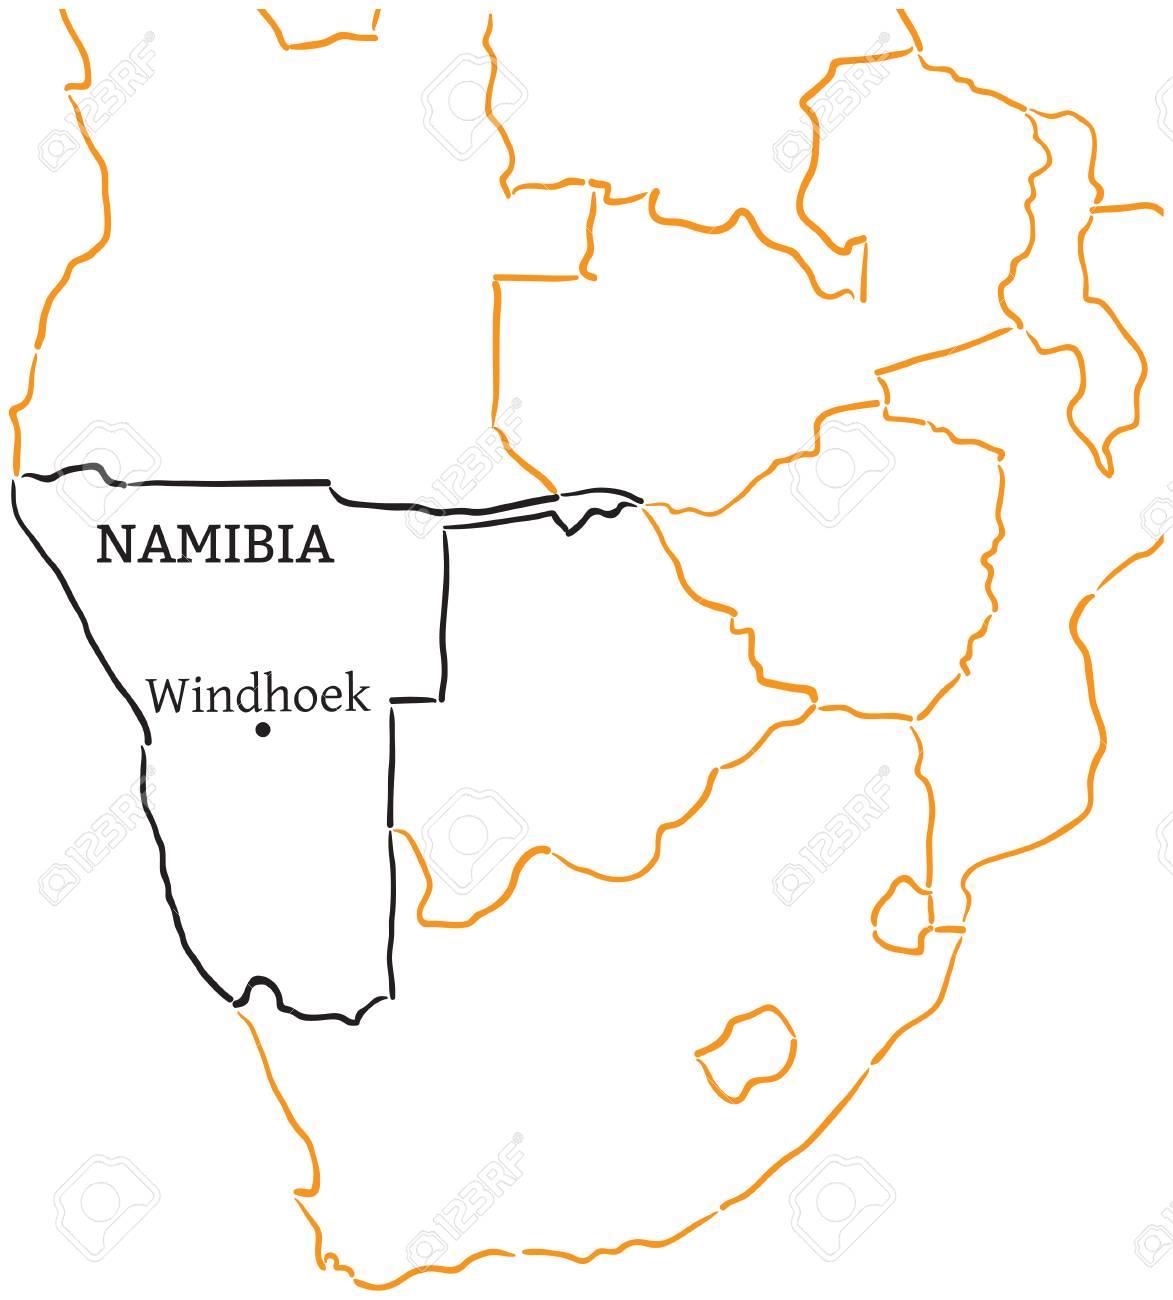 Namibia Land Mit Der Hauptstadt Windhoek In Afrika